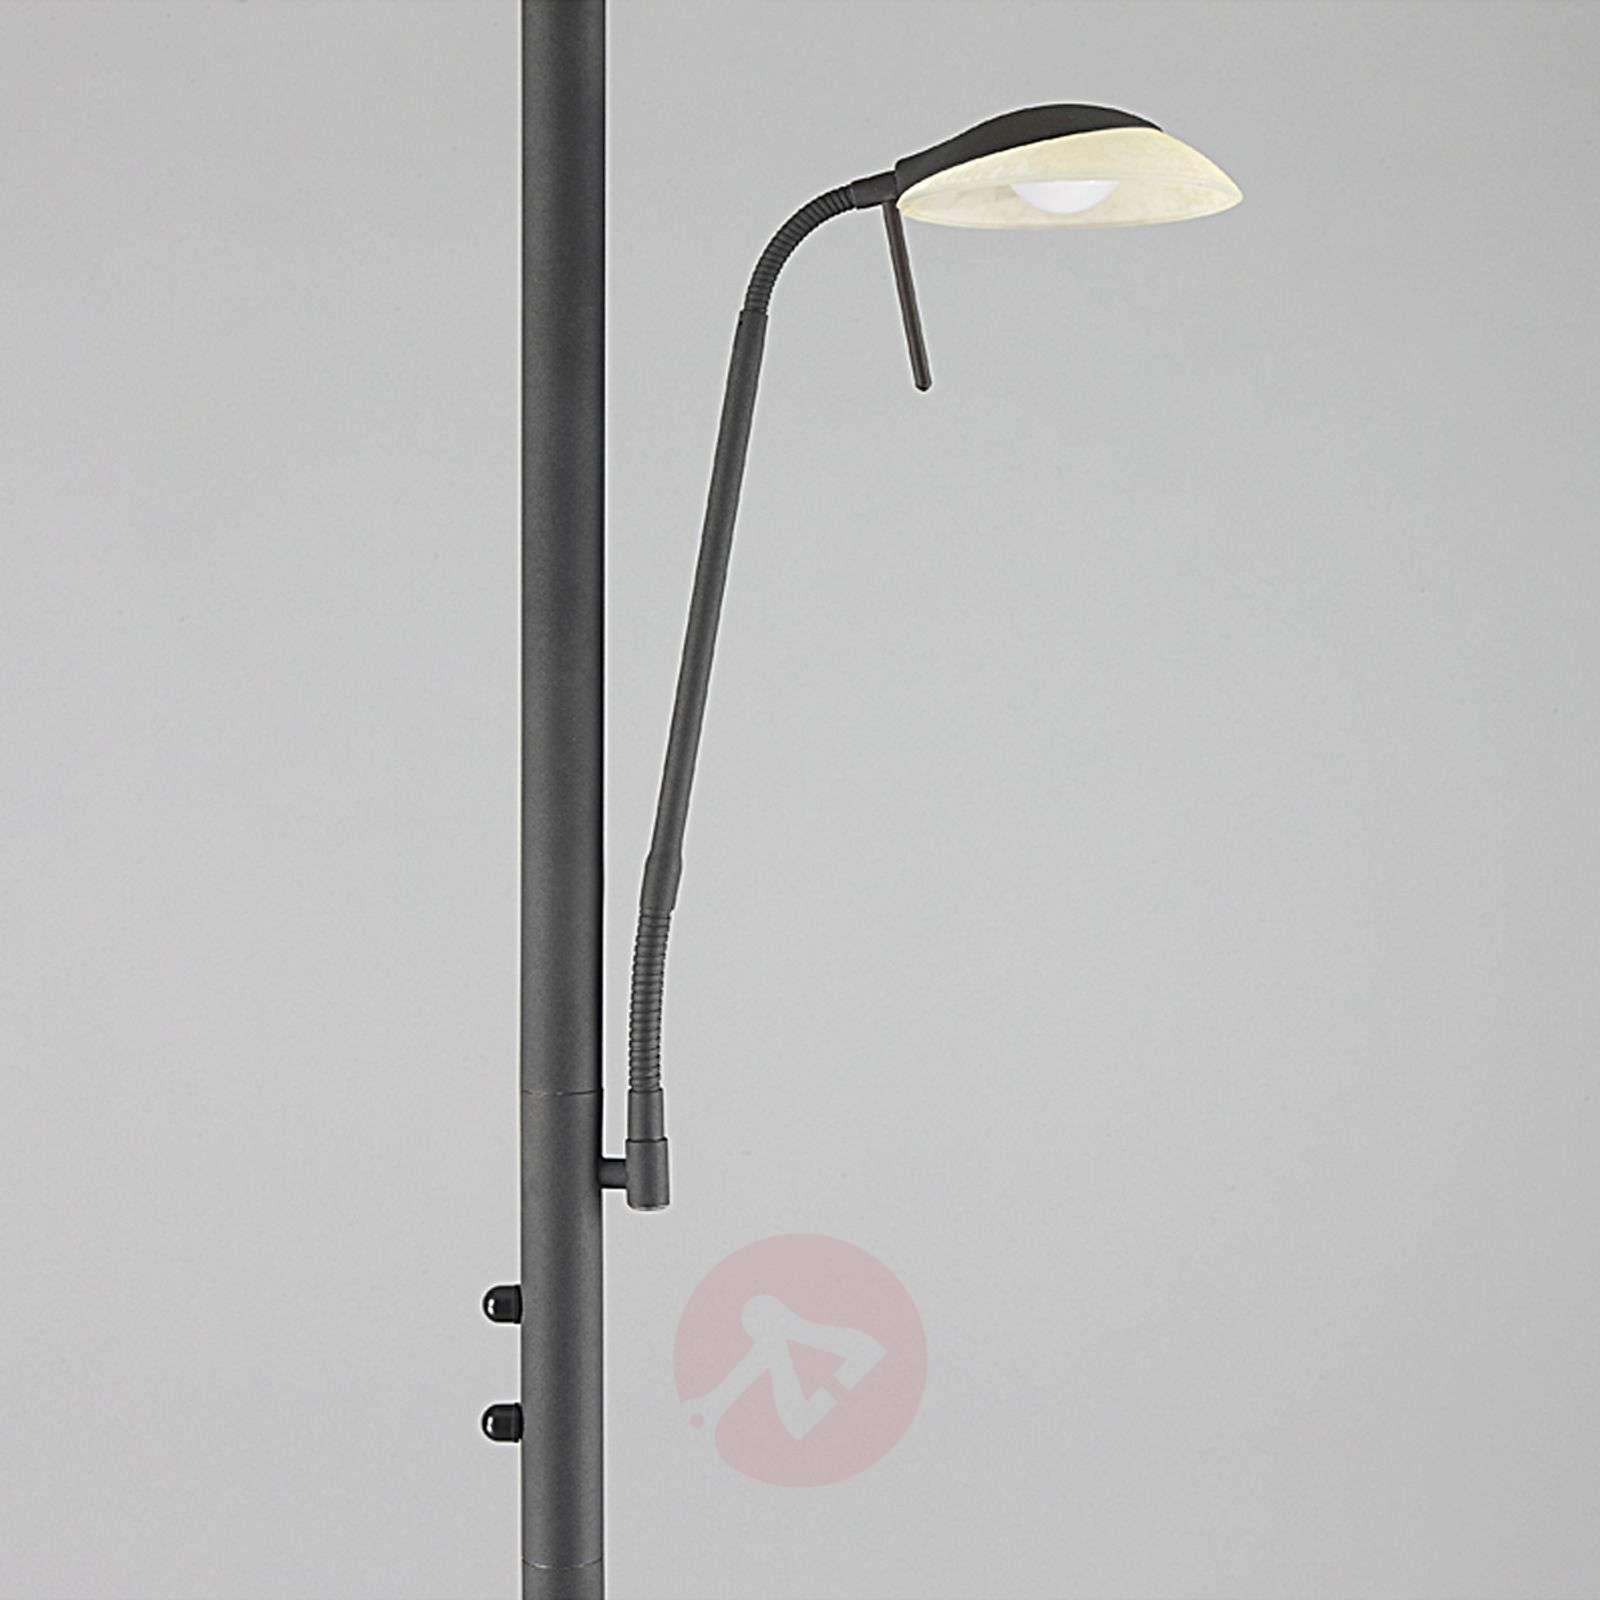 LED floor lamp Ragna with reading light, rust-9620650-011